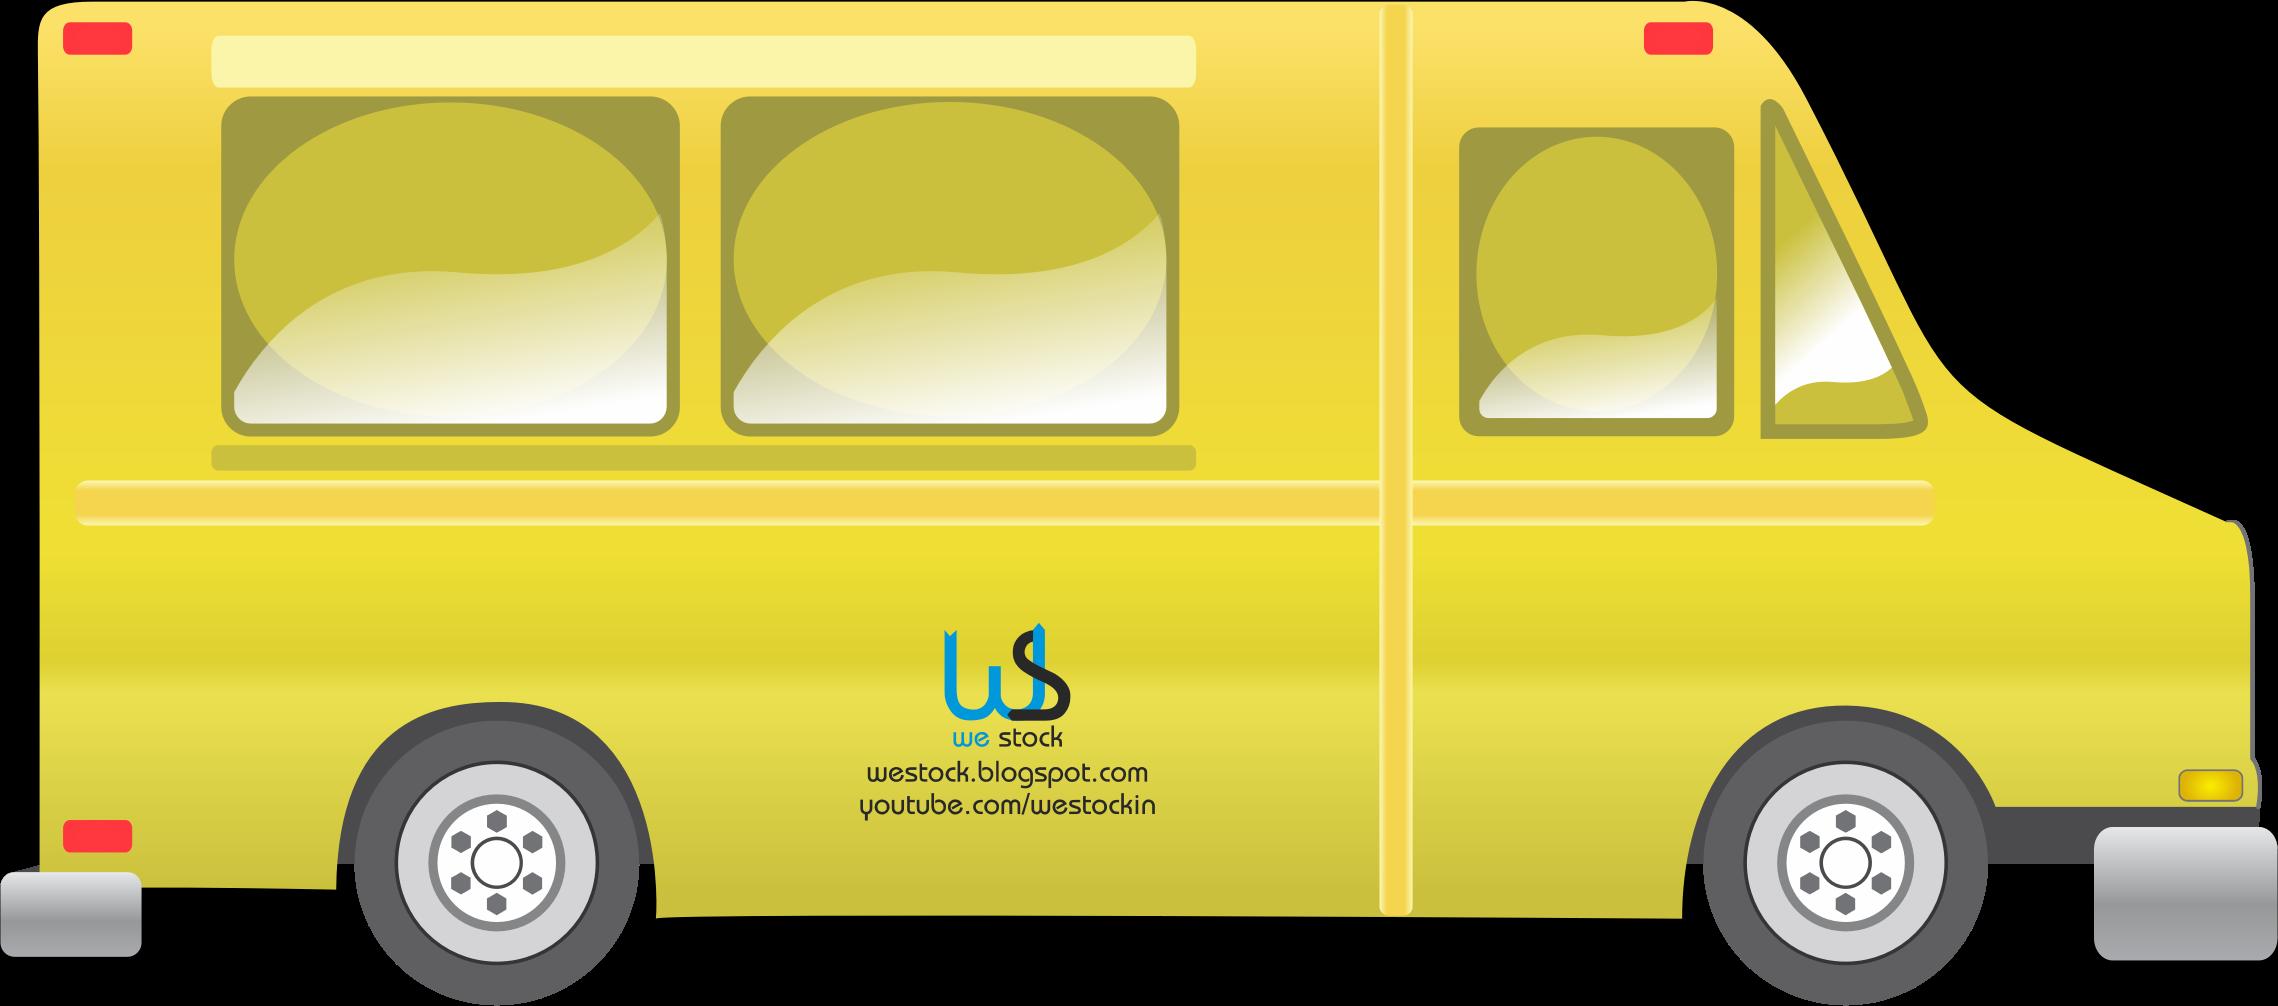 Food truck big image. Transportation clipart vector